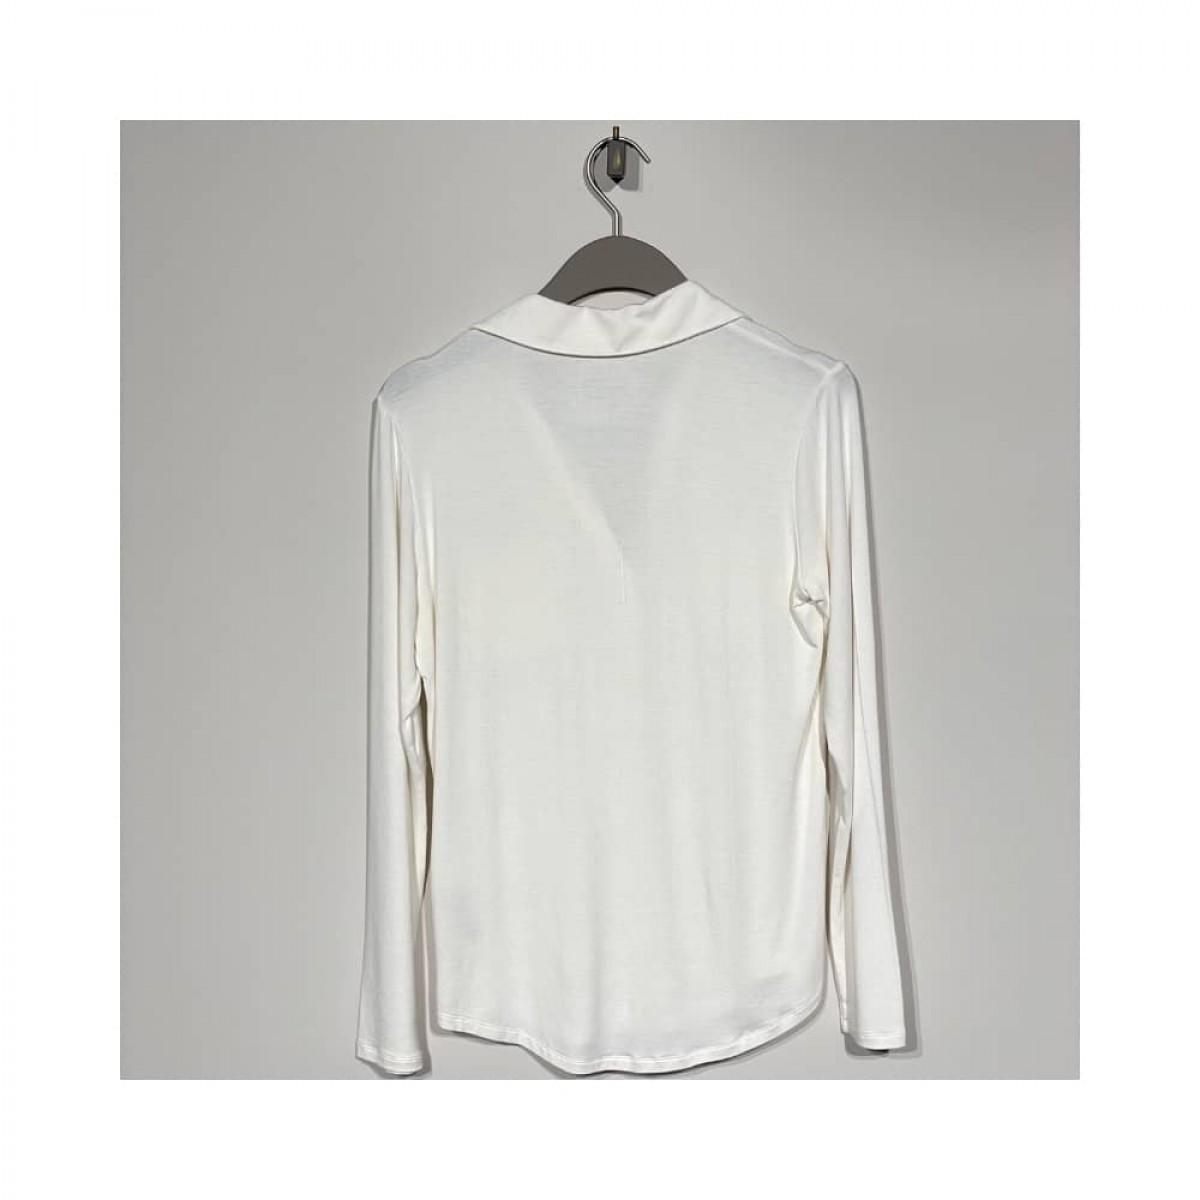 jersey skjorte - milk - bag